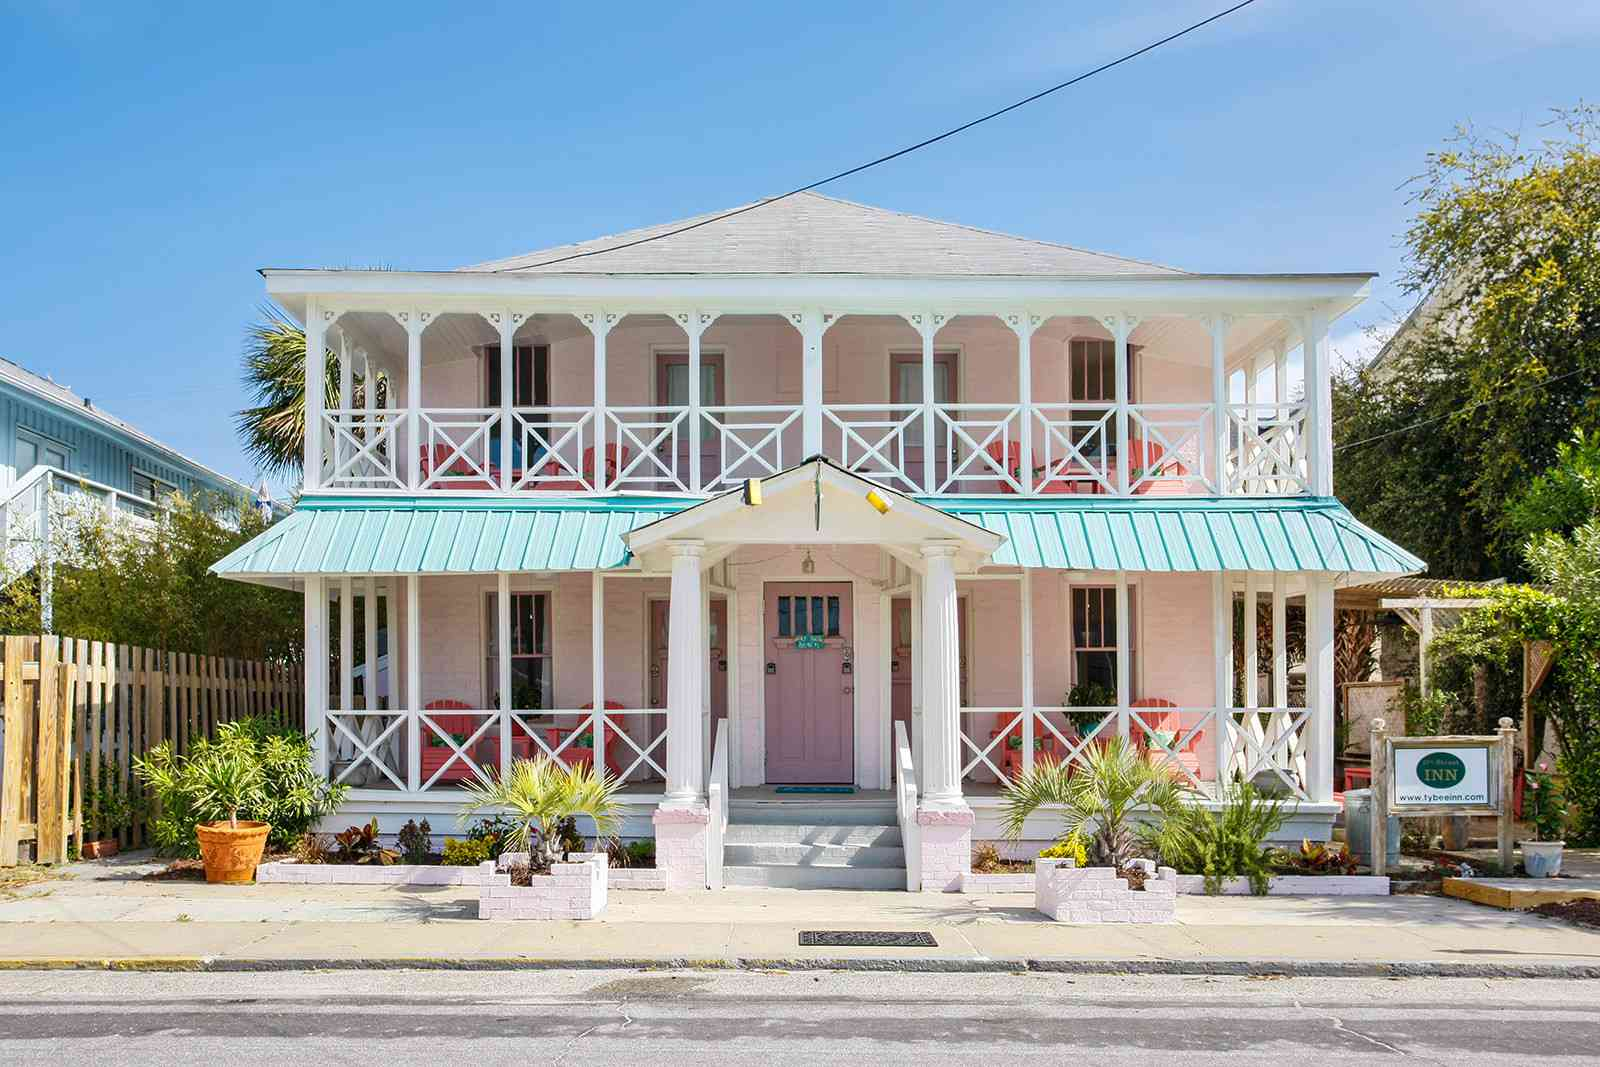 17th Street Inn on Tybee Island